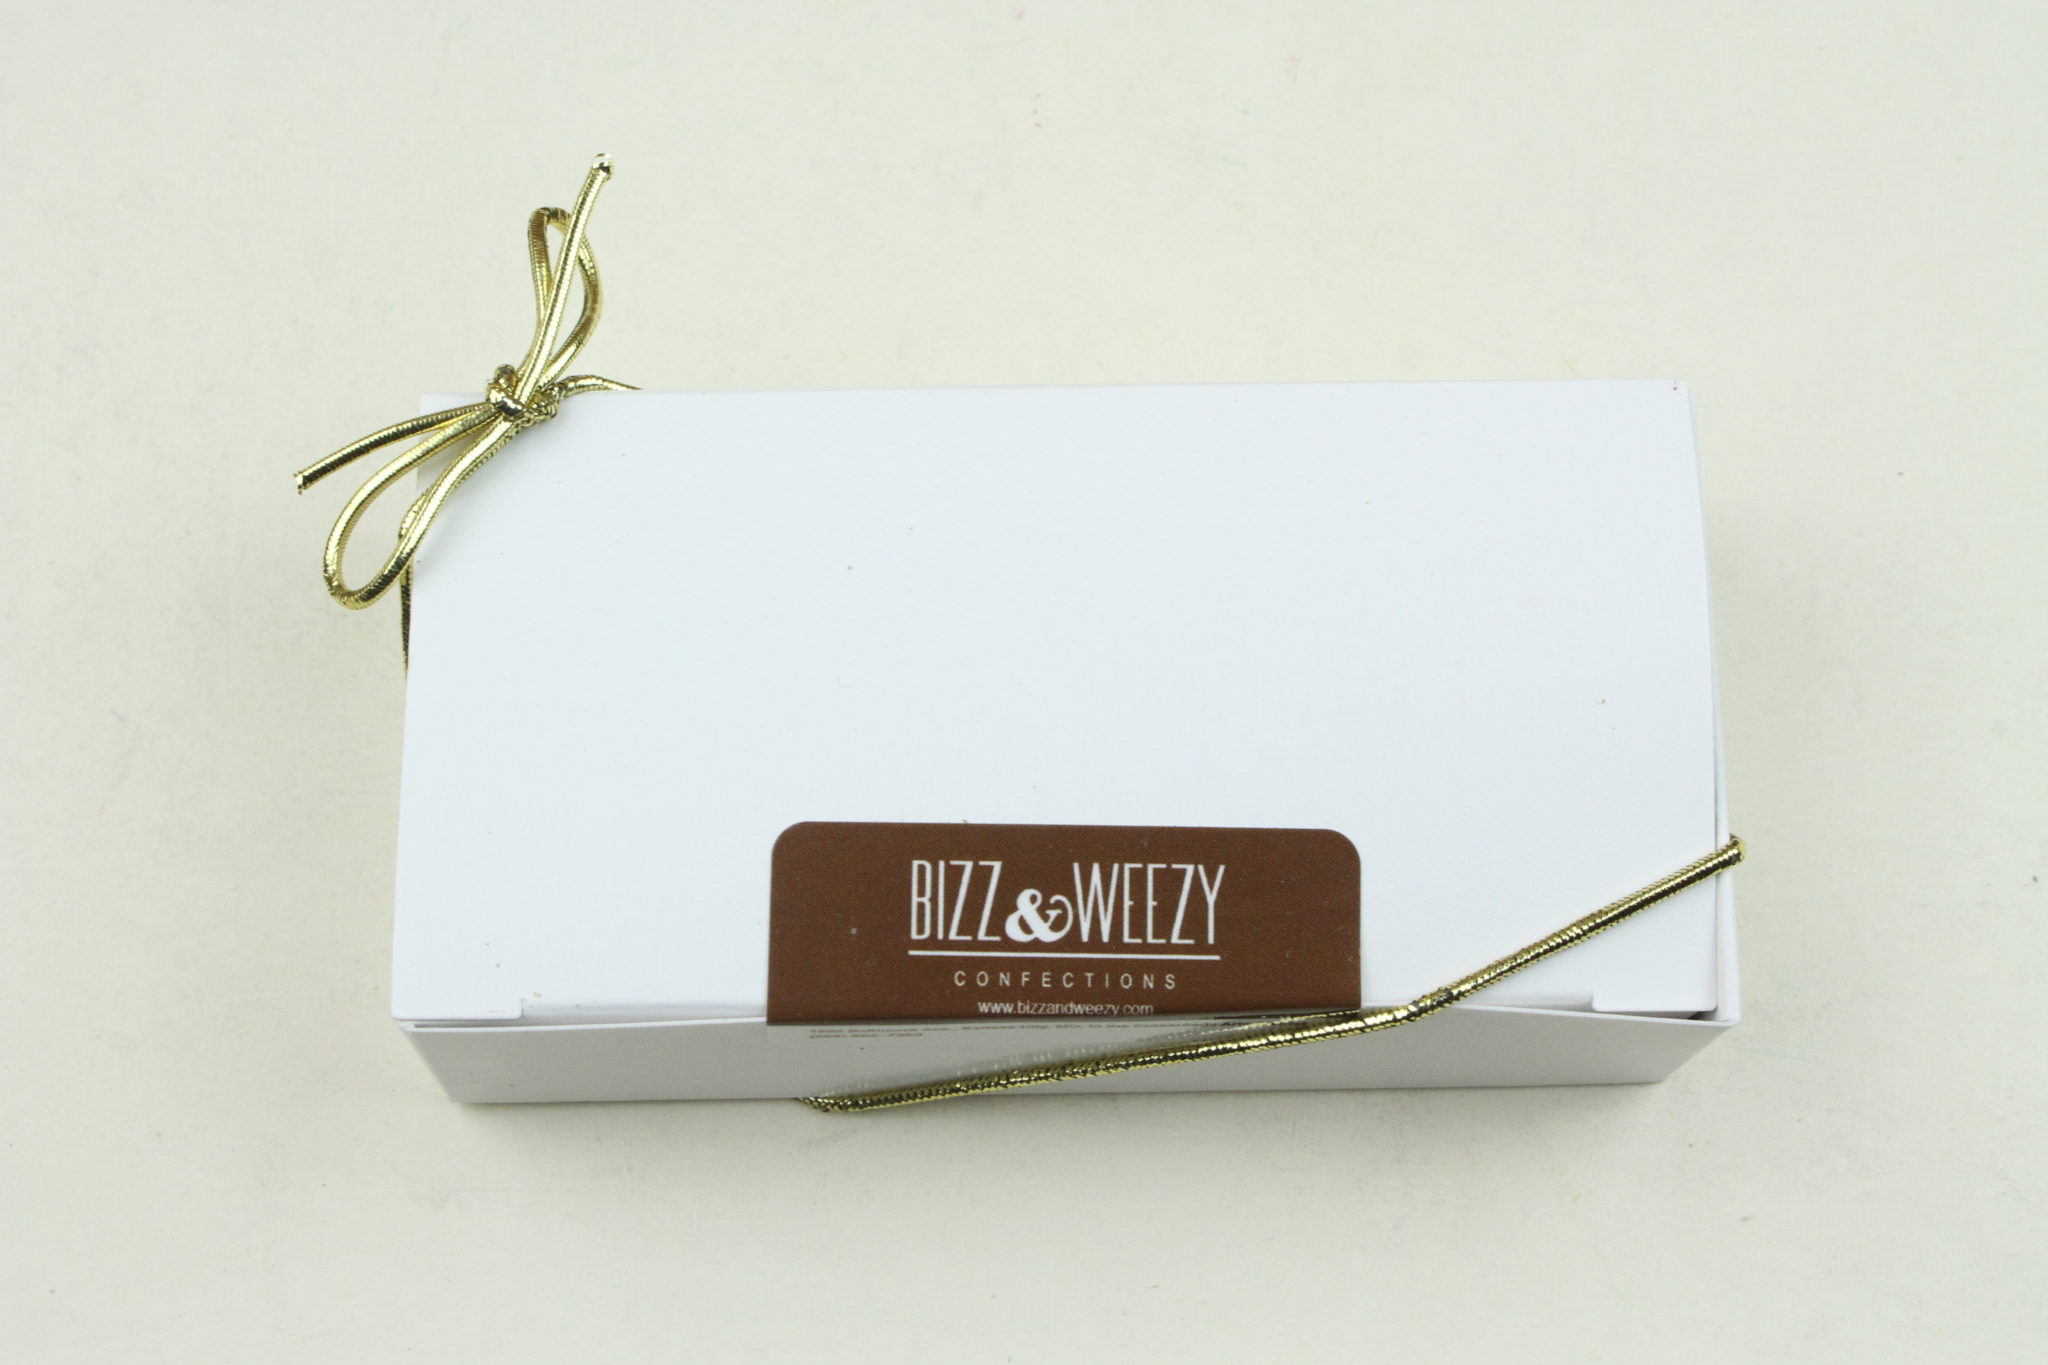 Bizz & Weezy Confections Chocolate Bark